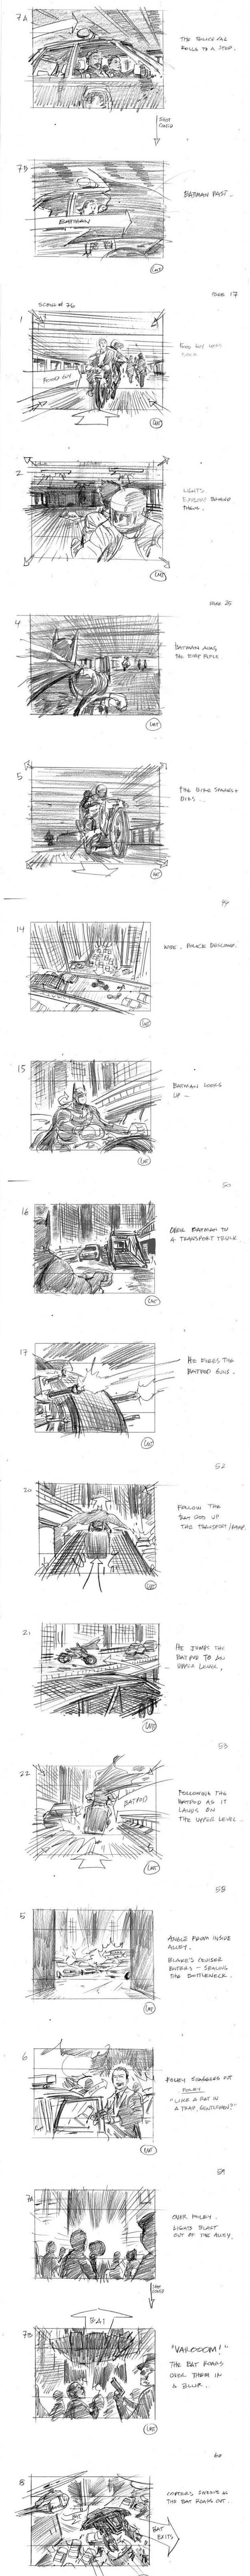 http://99designs.com/designer-blog/2013/10/15/from-sketch-to-spectacle-famous-movie-storyboards/ Christopher Nolan (director), Gabriel Hardman (artist)